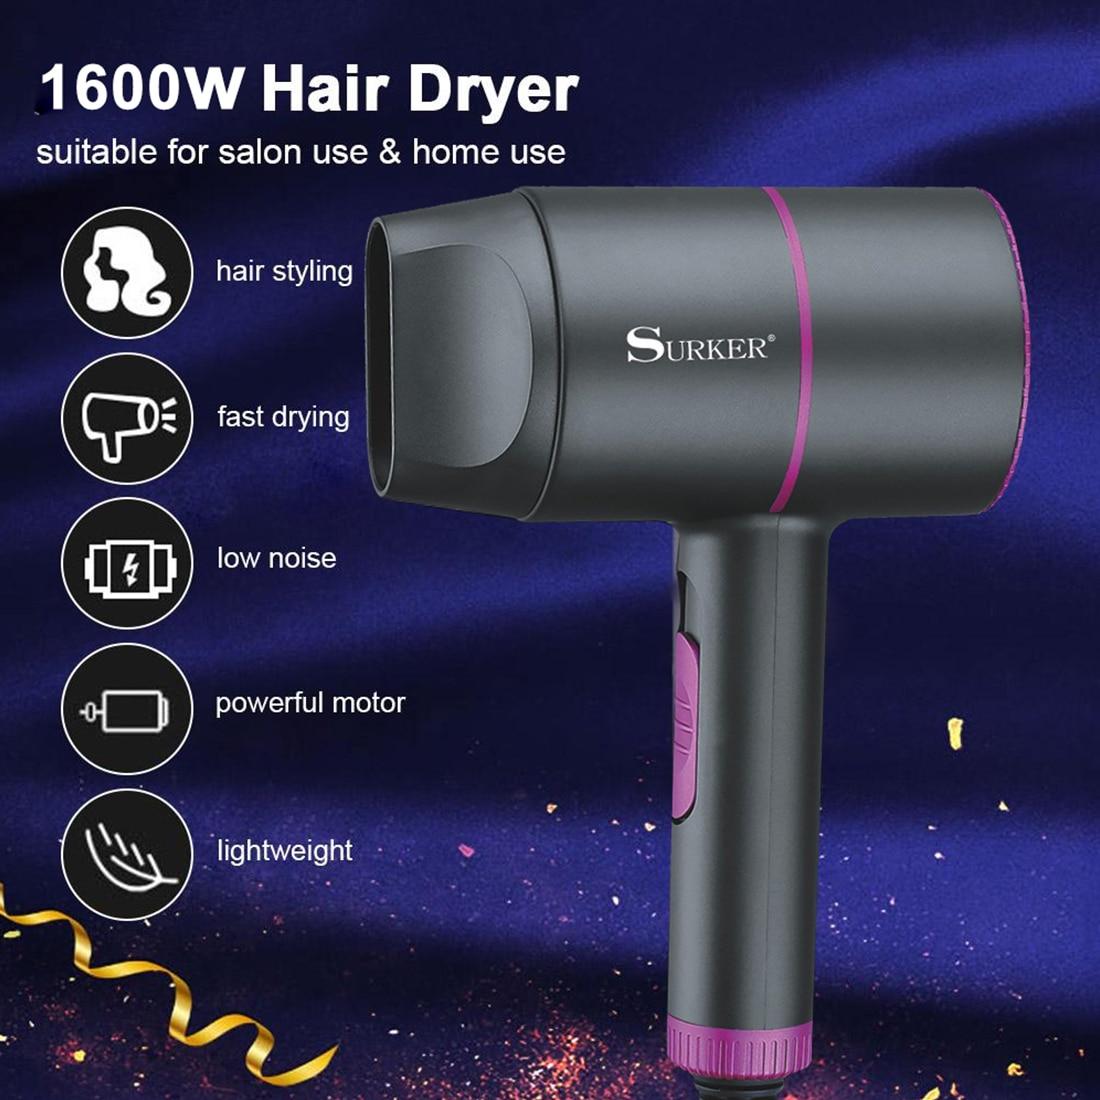 1600w secador de cabelo profissional secador de cabelo secador de salao de beleza